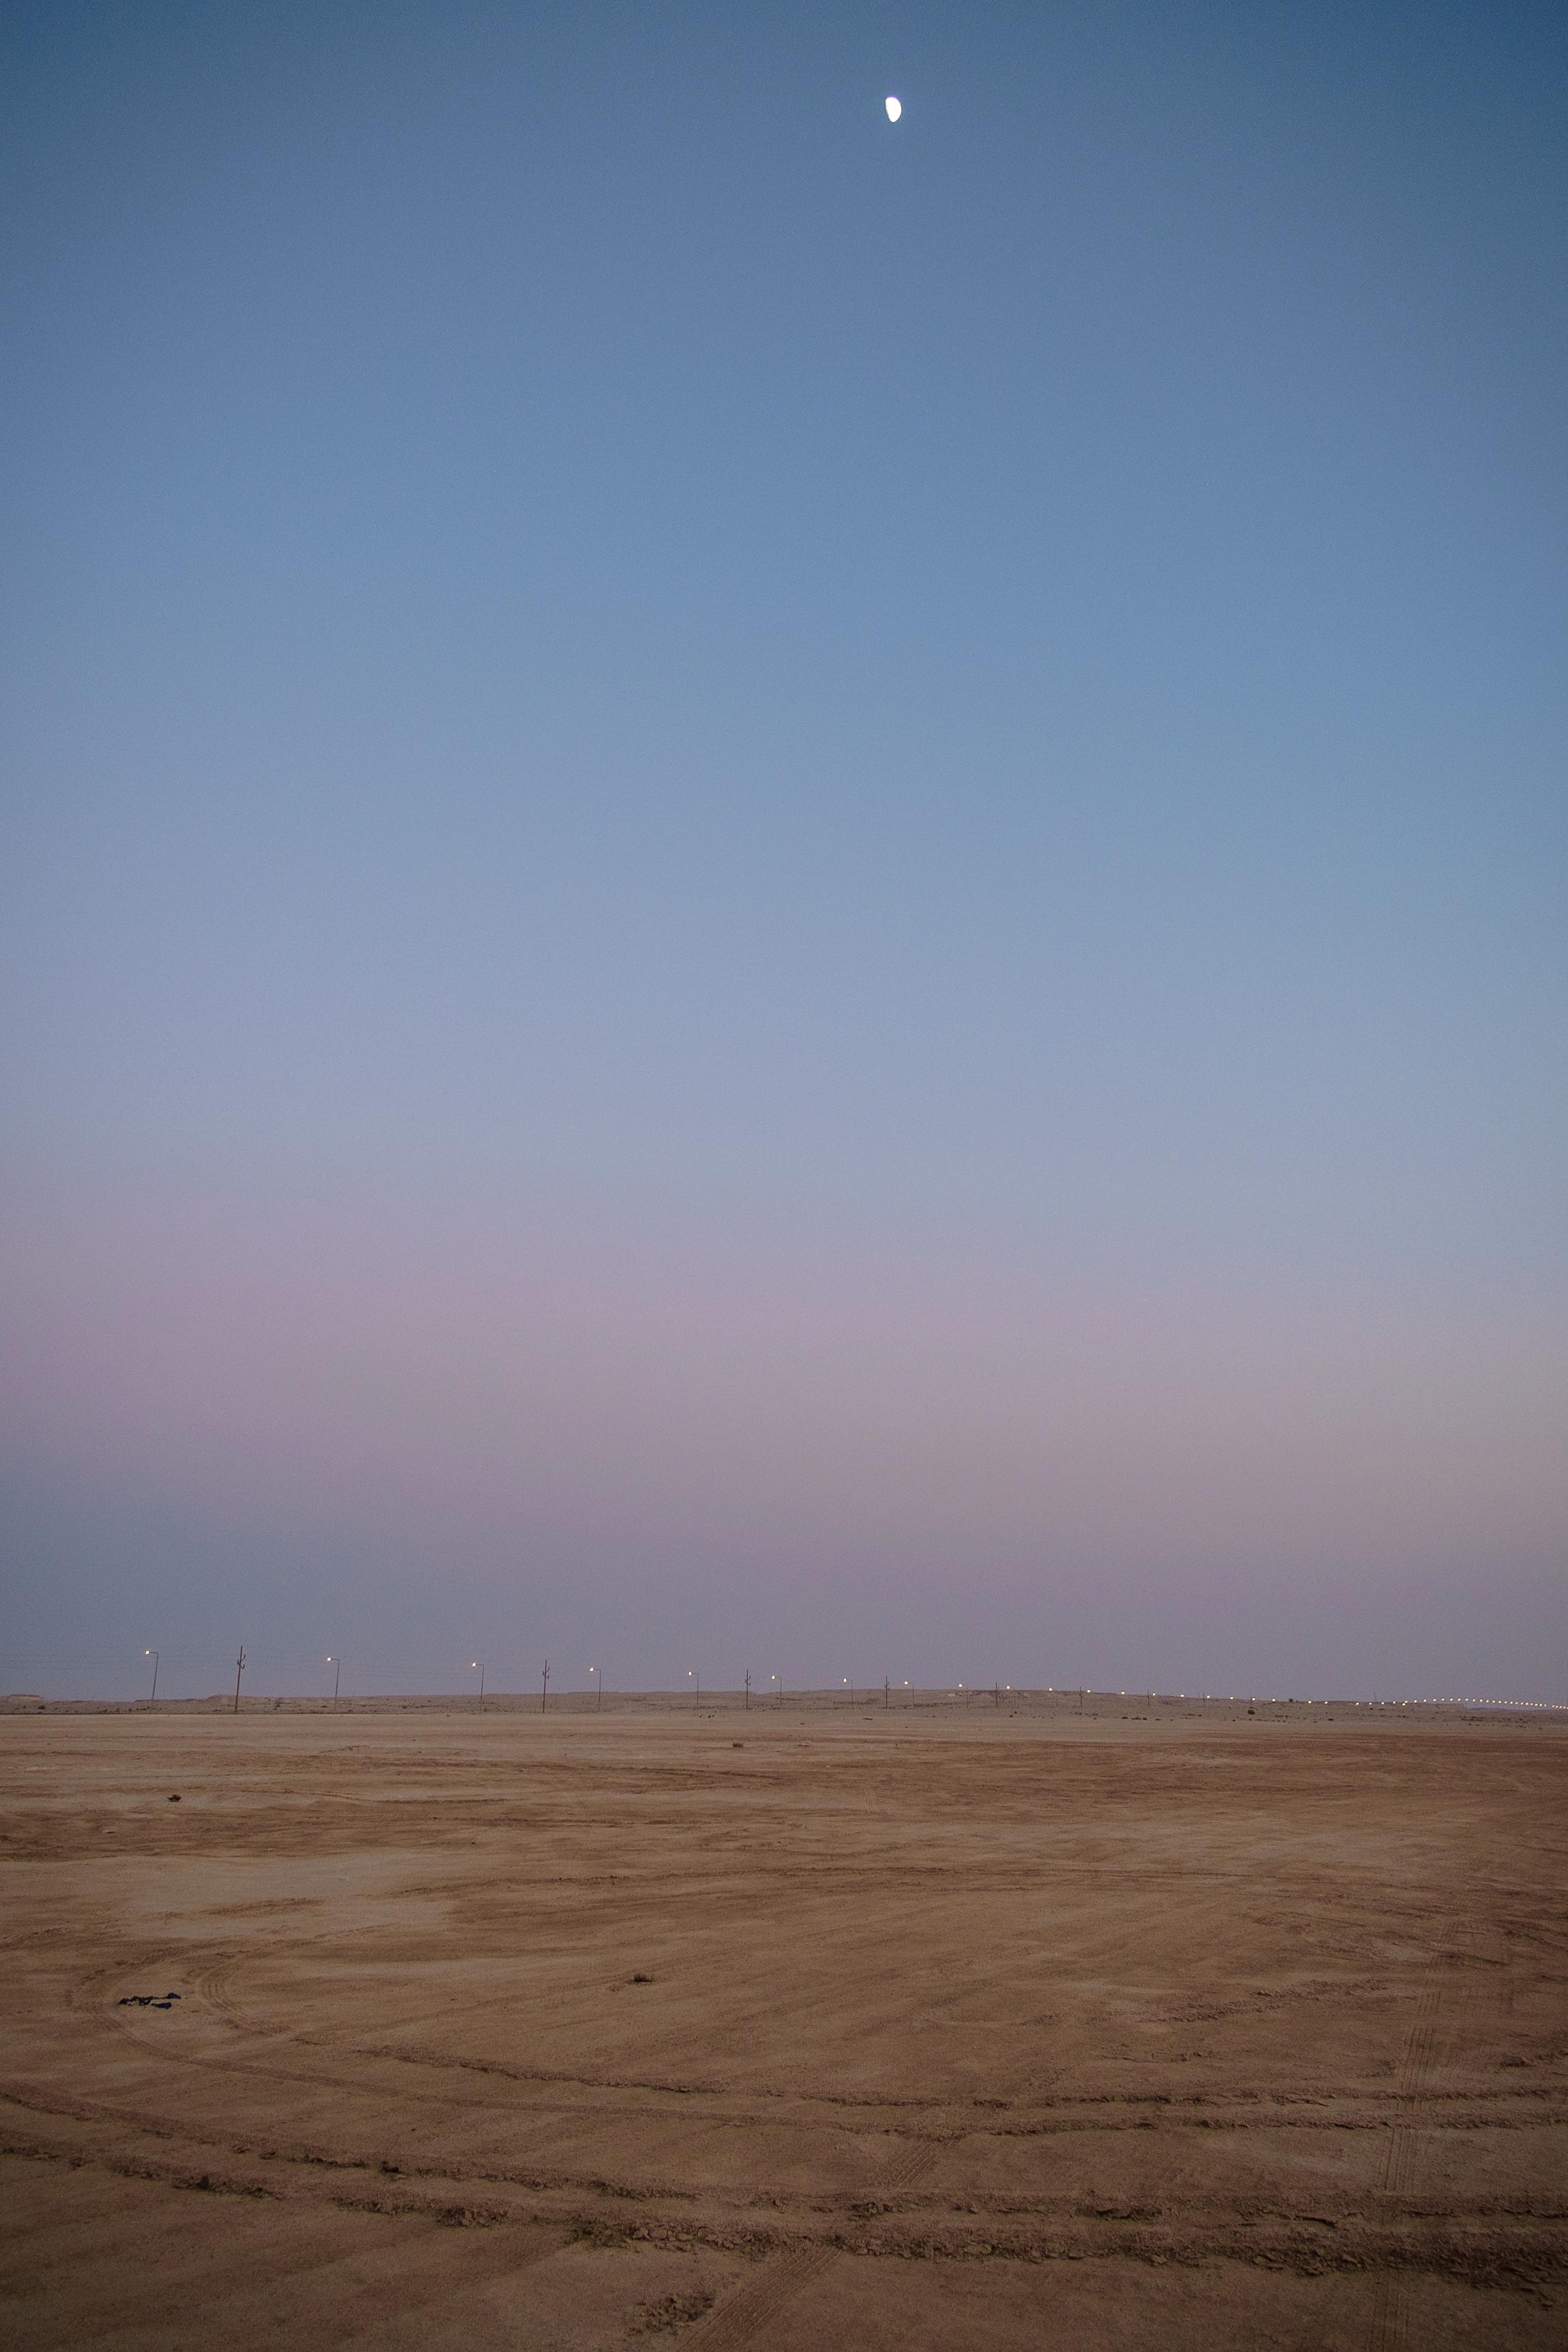 The moon is seen rising above the desert in Zekreet at dusk.